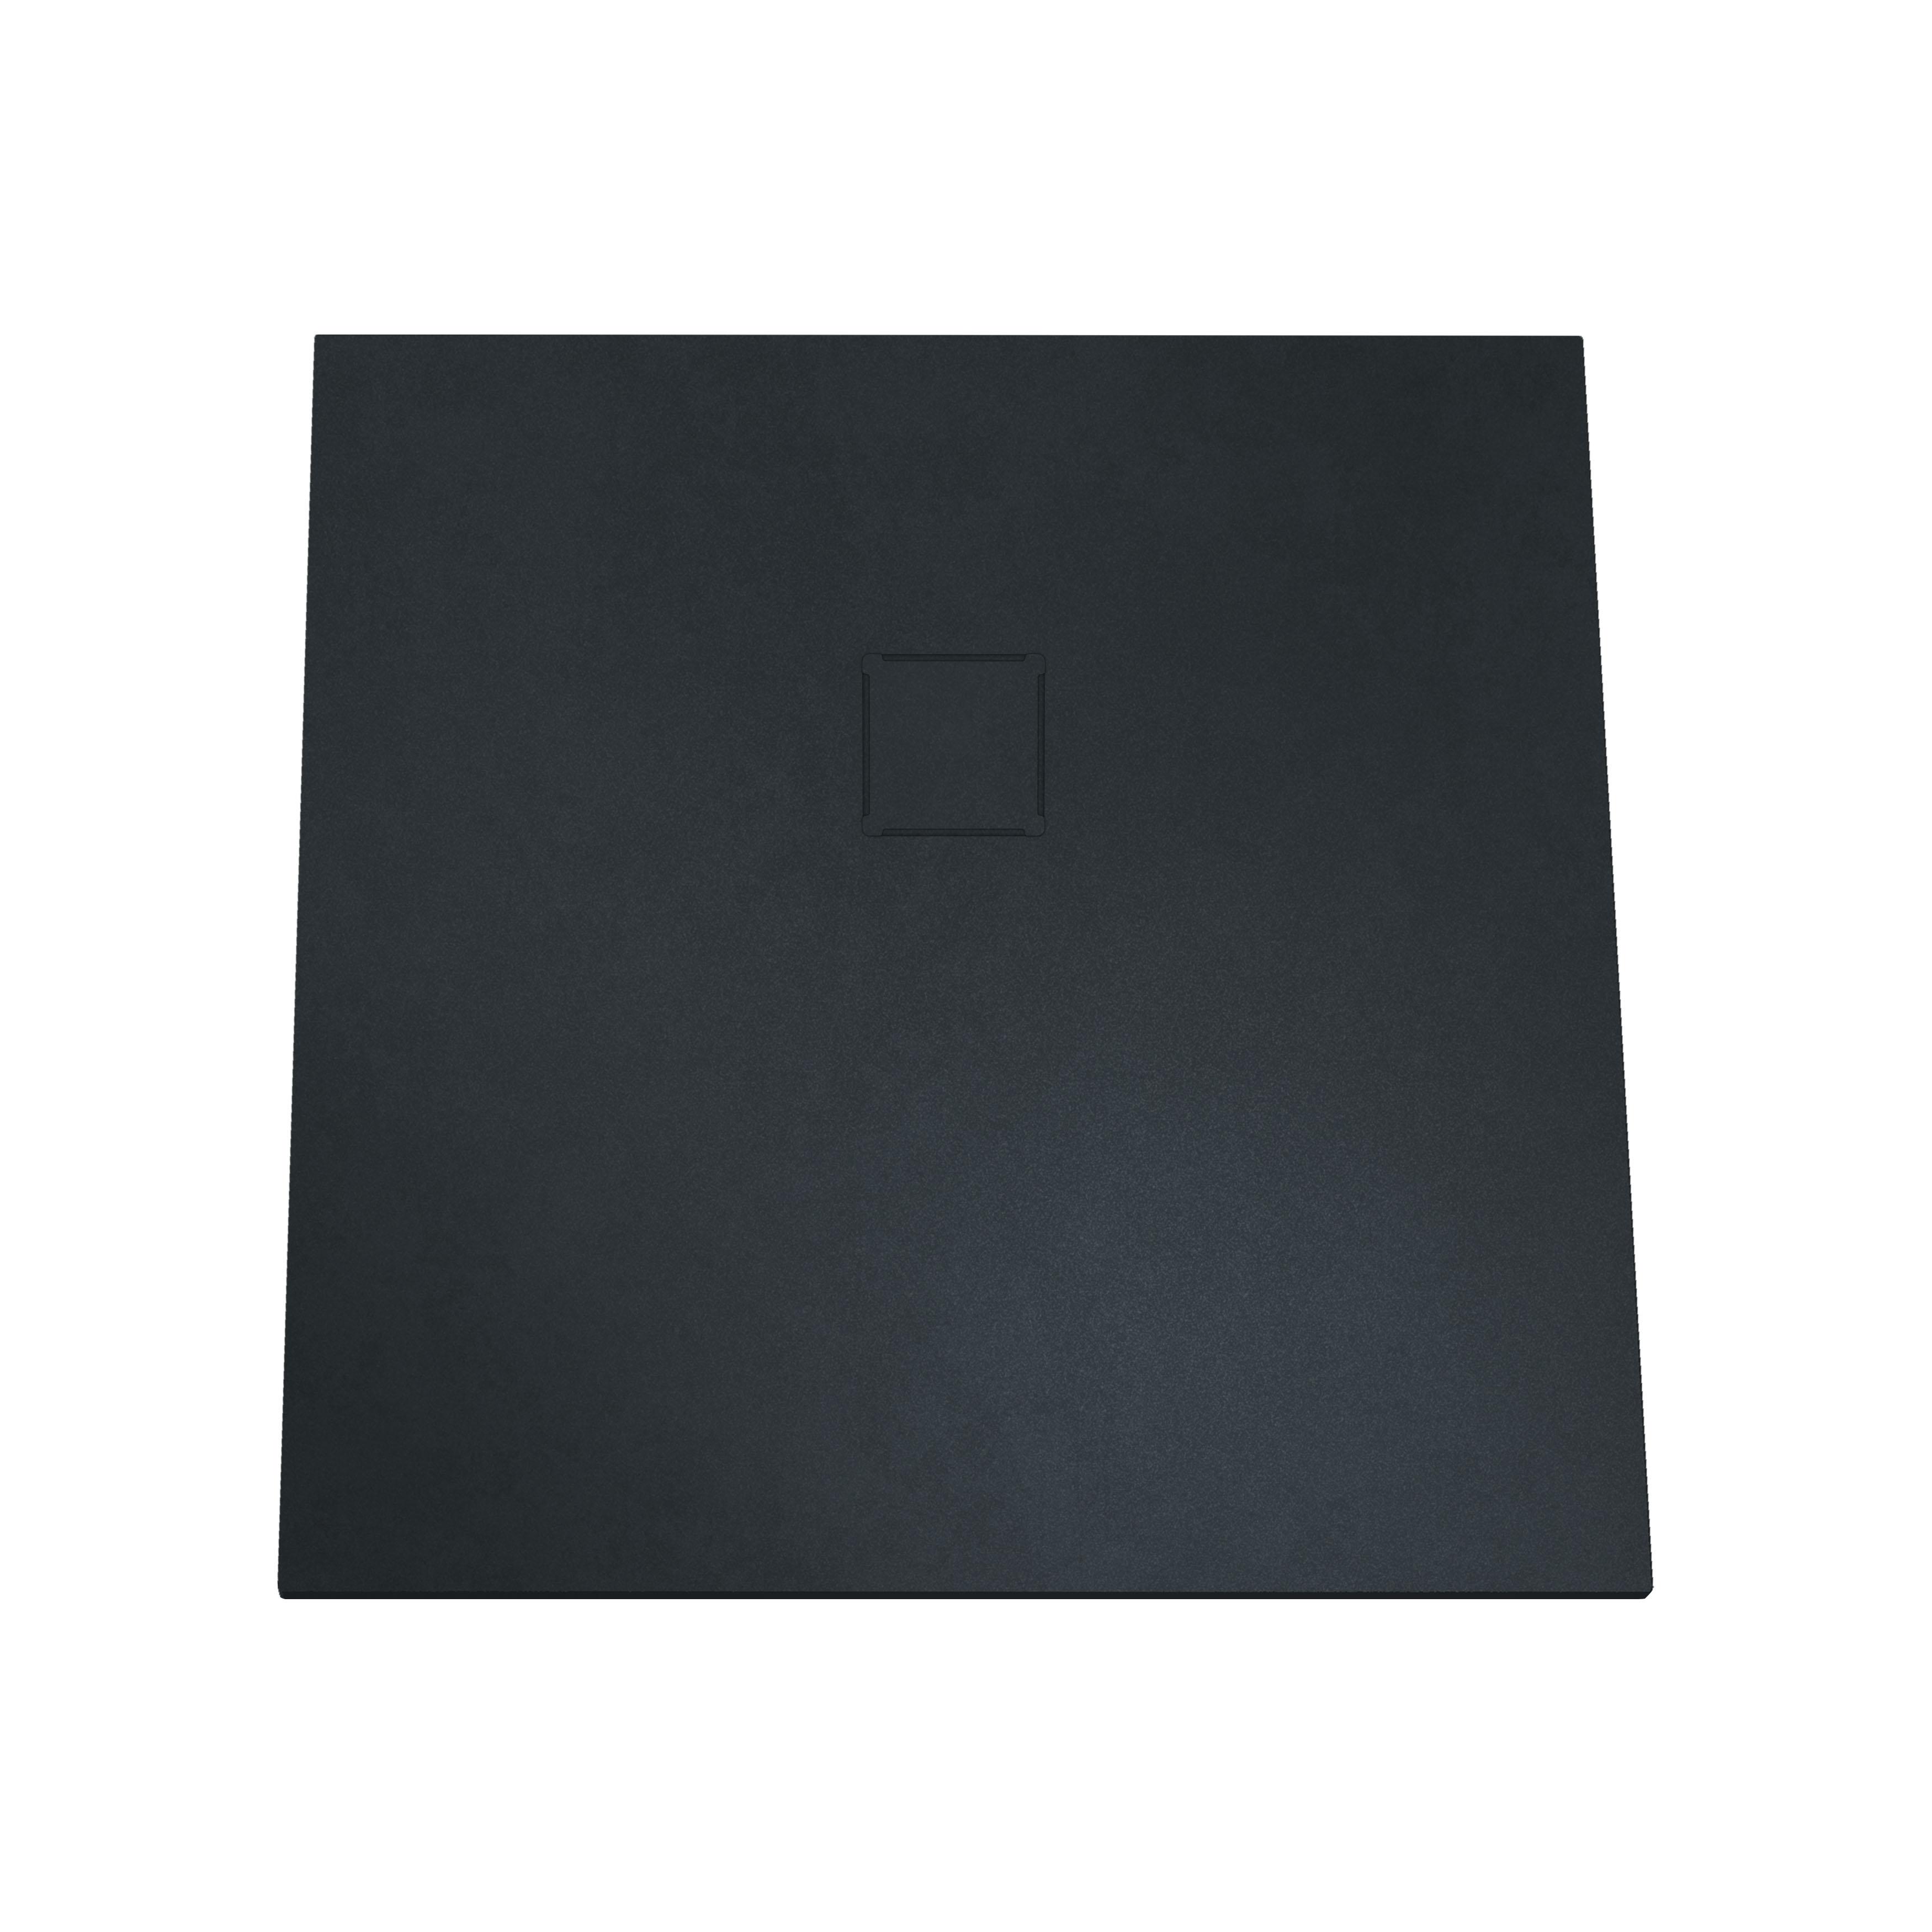 V-stone, receveur ultra plat en solid stone, 80 cm, anthraciteacite